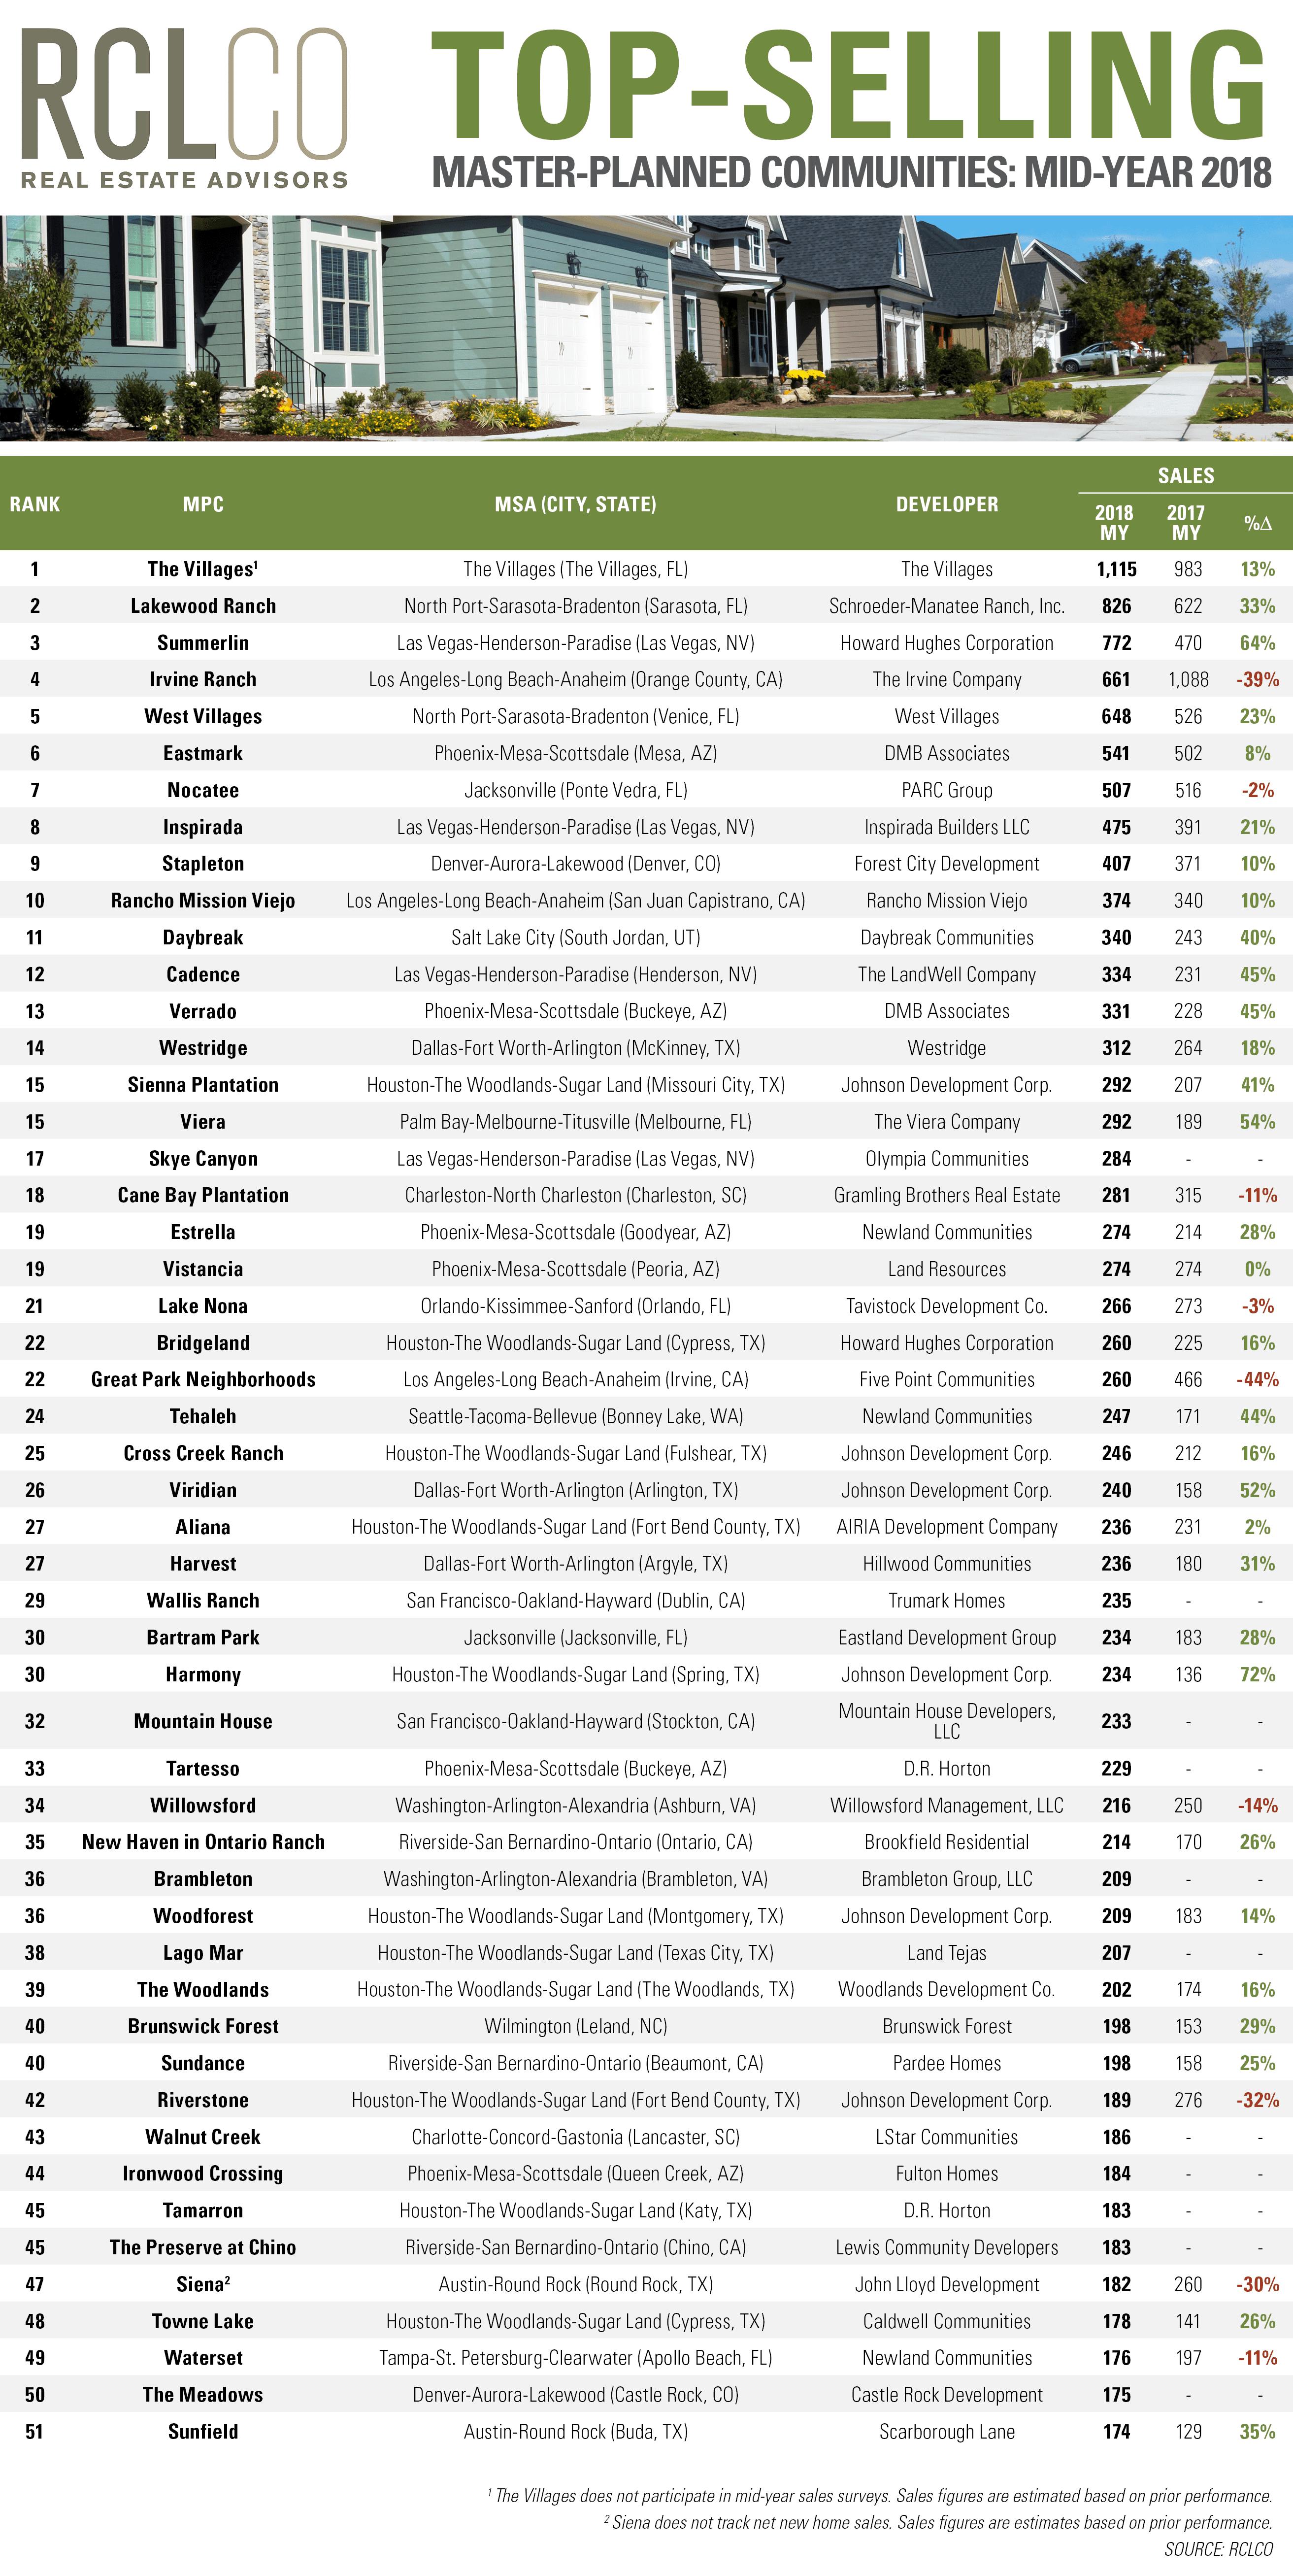 Advisory-Top-Selling-MPCs-Mid-Year-2018